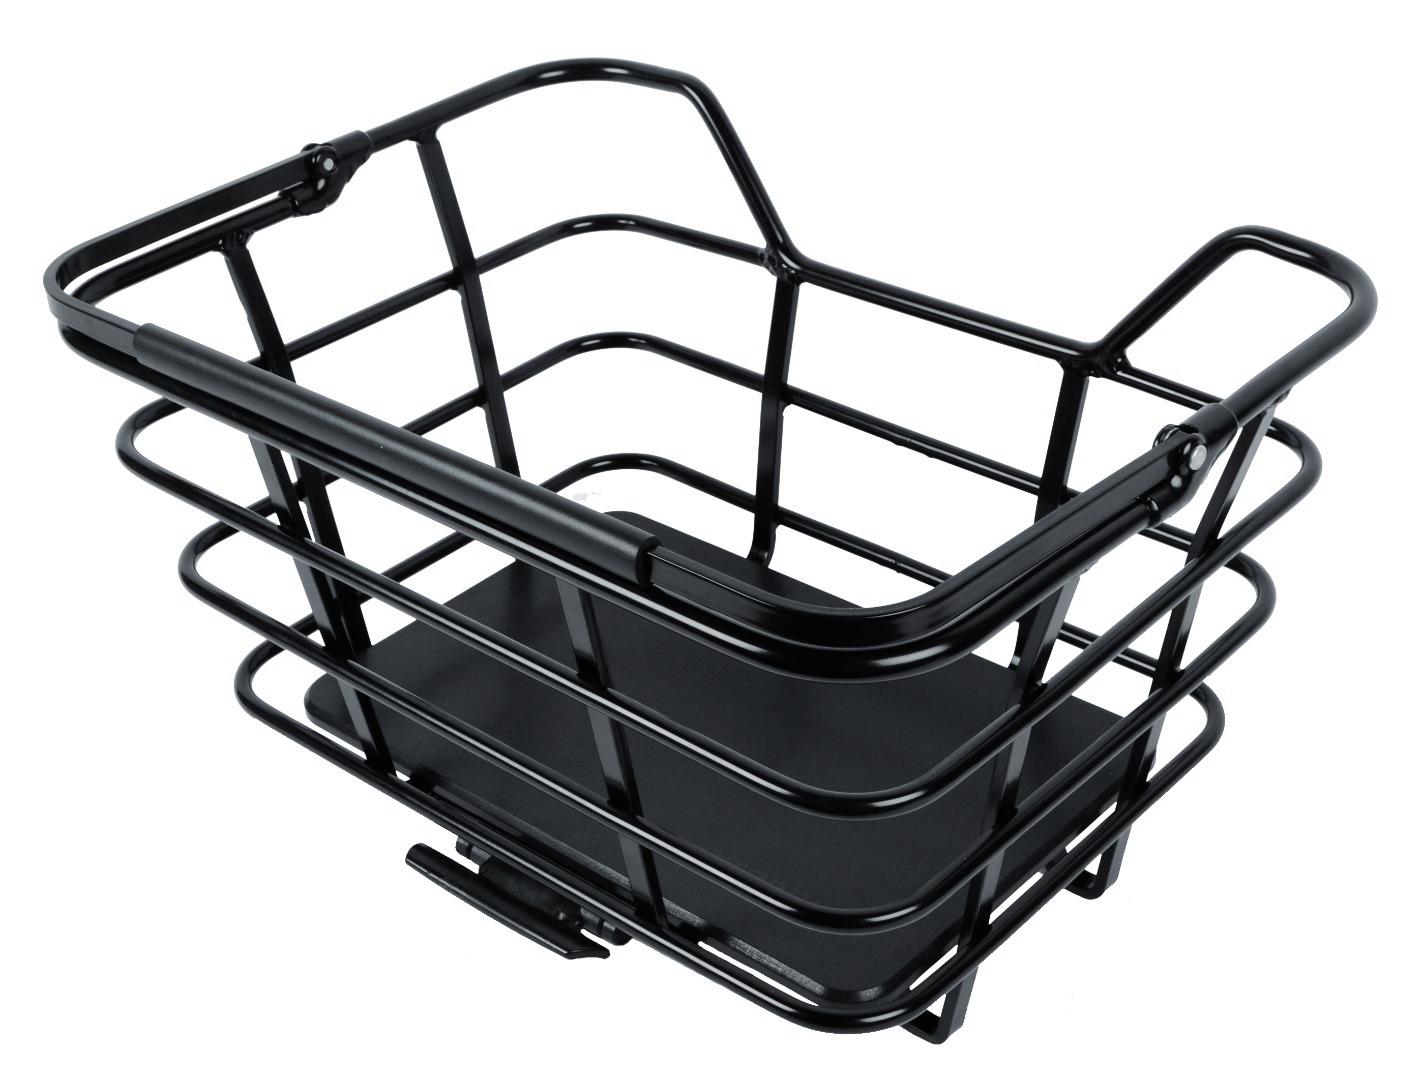 Atran Velo - Epic - Cykelkurv til bag - AVS system - 23 liter - Aluminium - Sort   Bike baskets